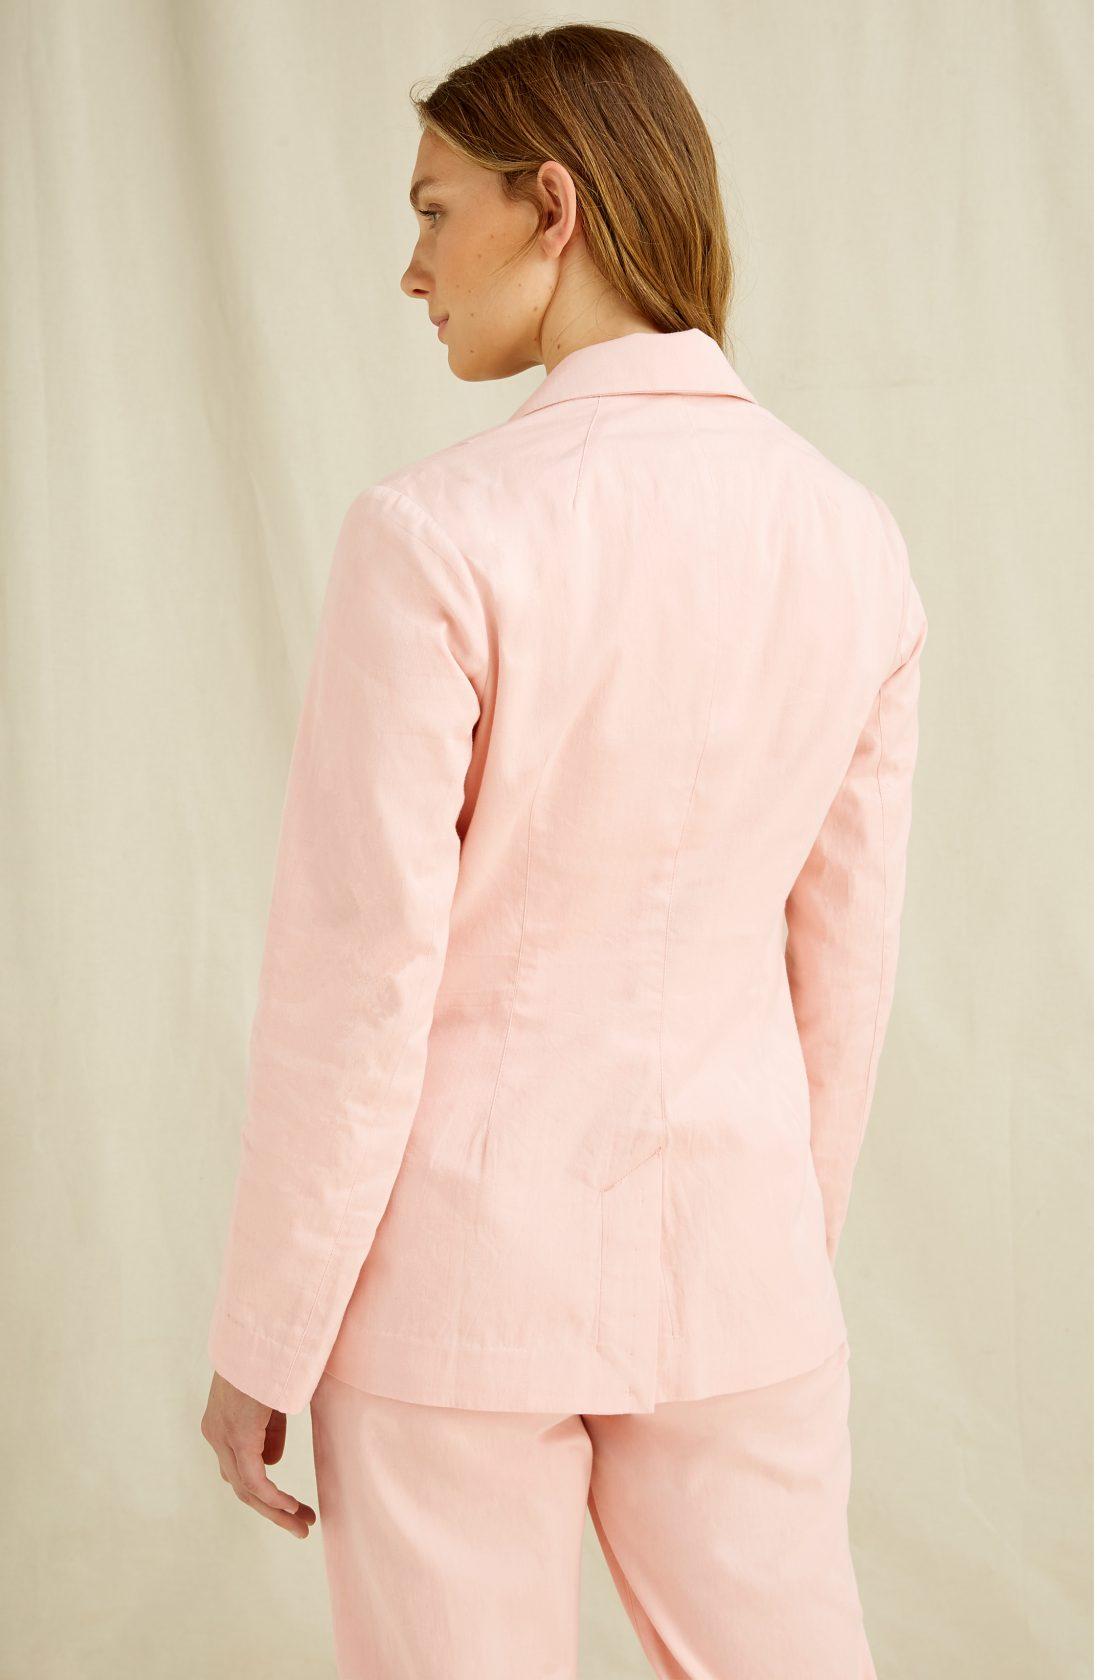 Roberta Organic Fashion Peopletree Mirren Blazer